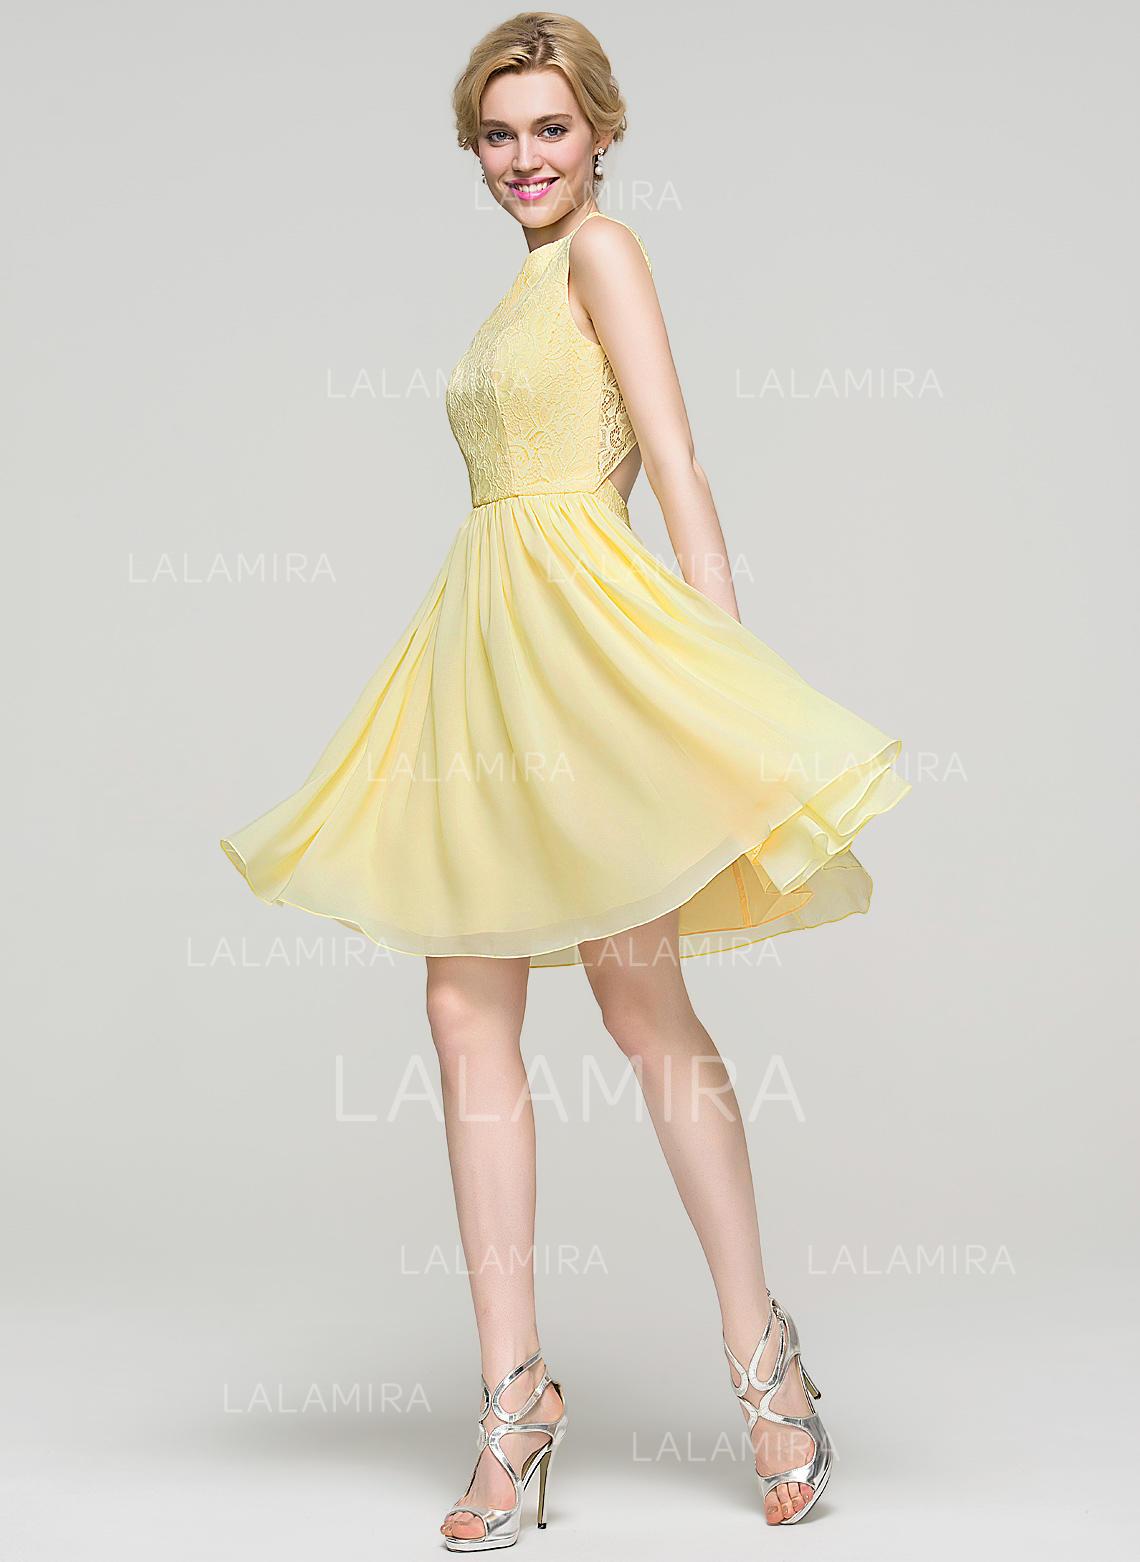 b464ad41b18 A-Line Princess Knee-Length Homecoming Dresses Scoop Neck Chiffon  Sleeveless (022214114. Loading zoom